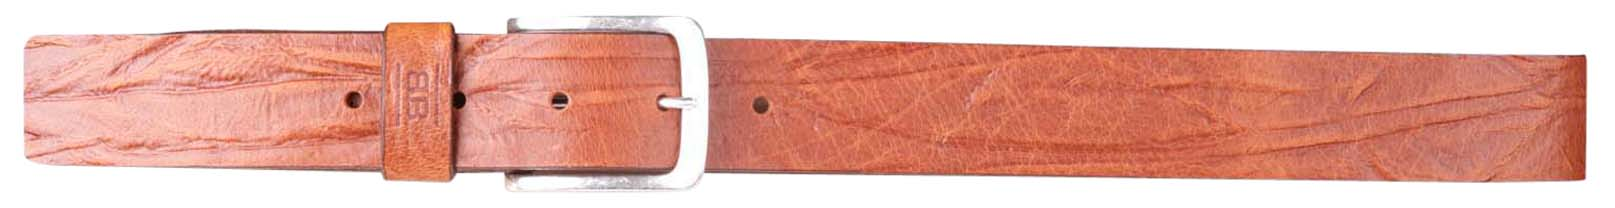 detail belt